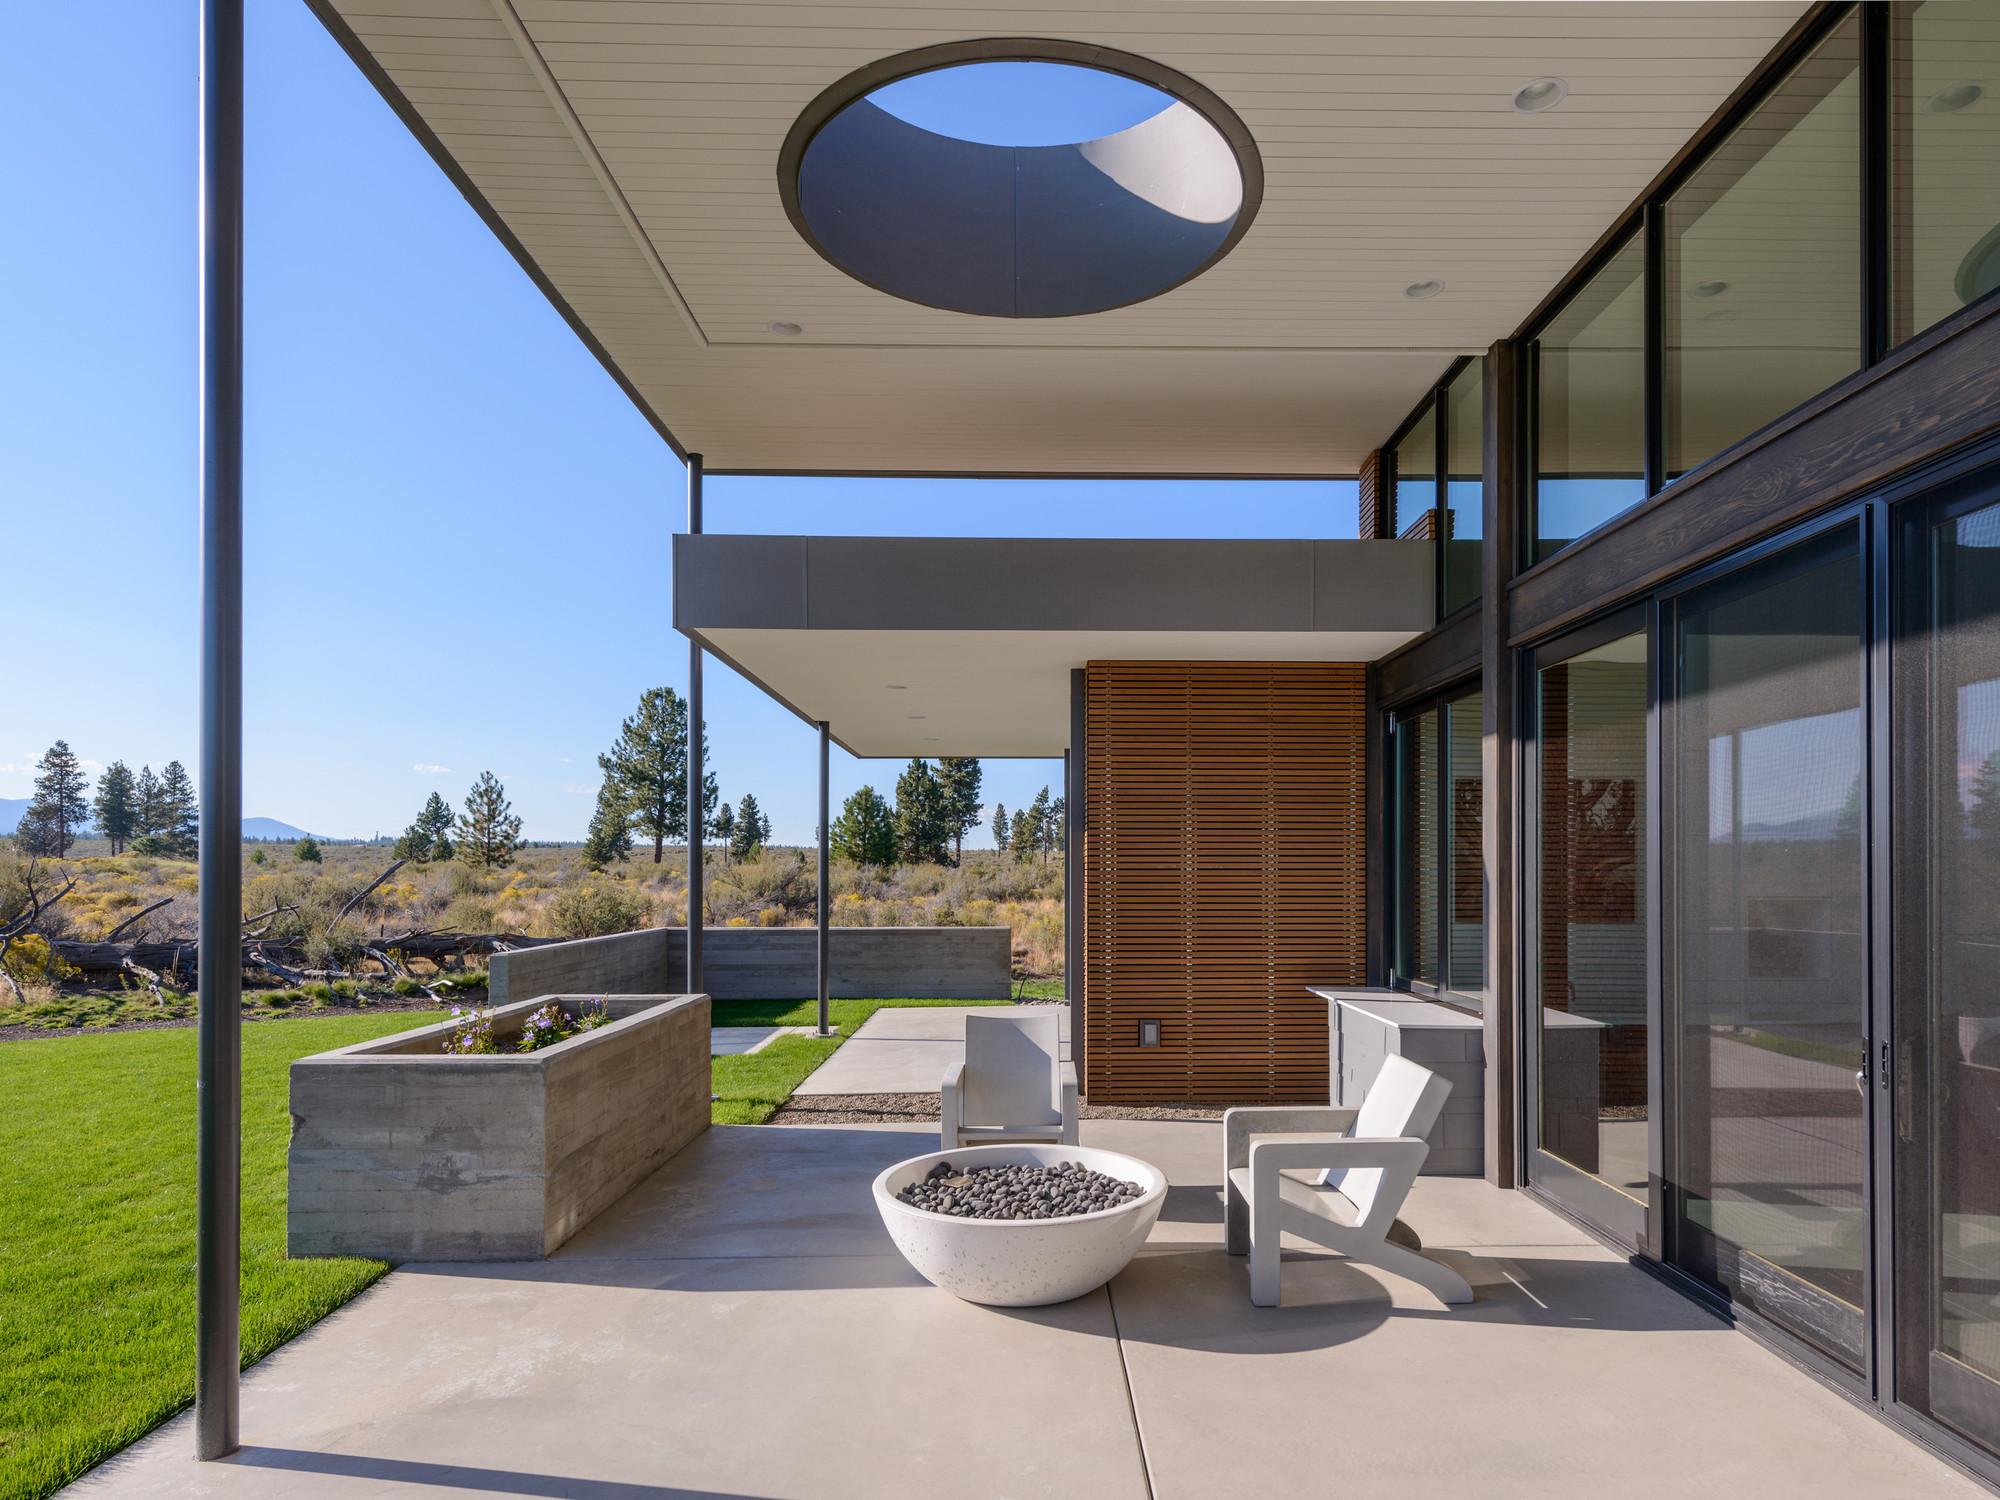 Filler Residence / PIQUE, © Alan Brandt